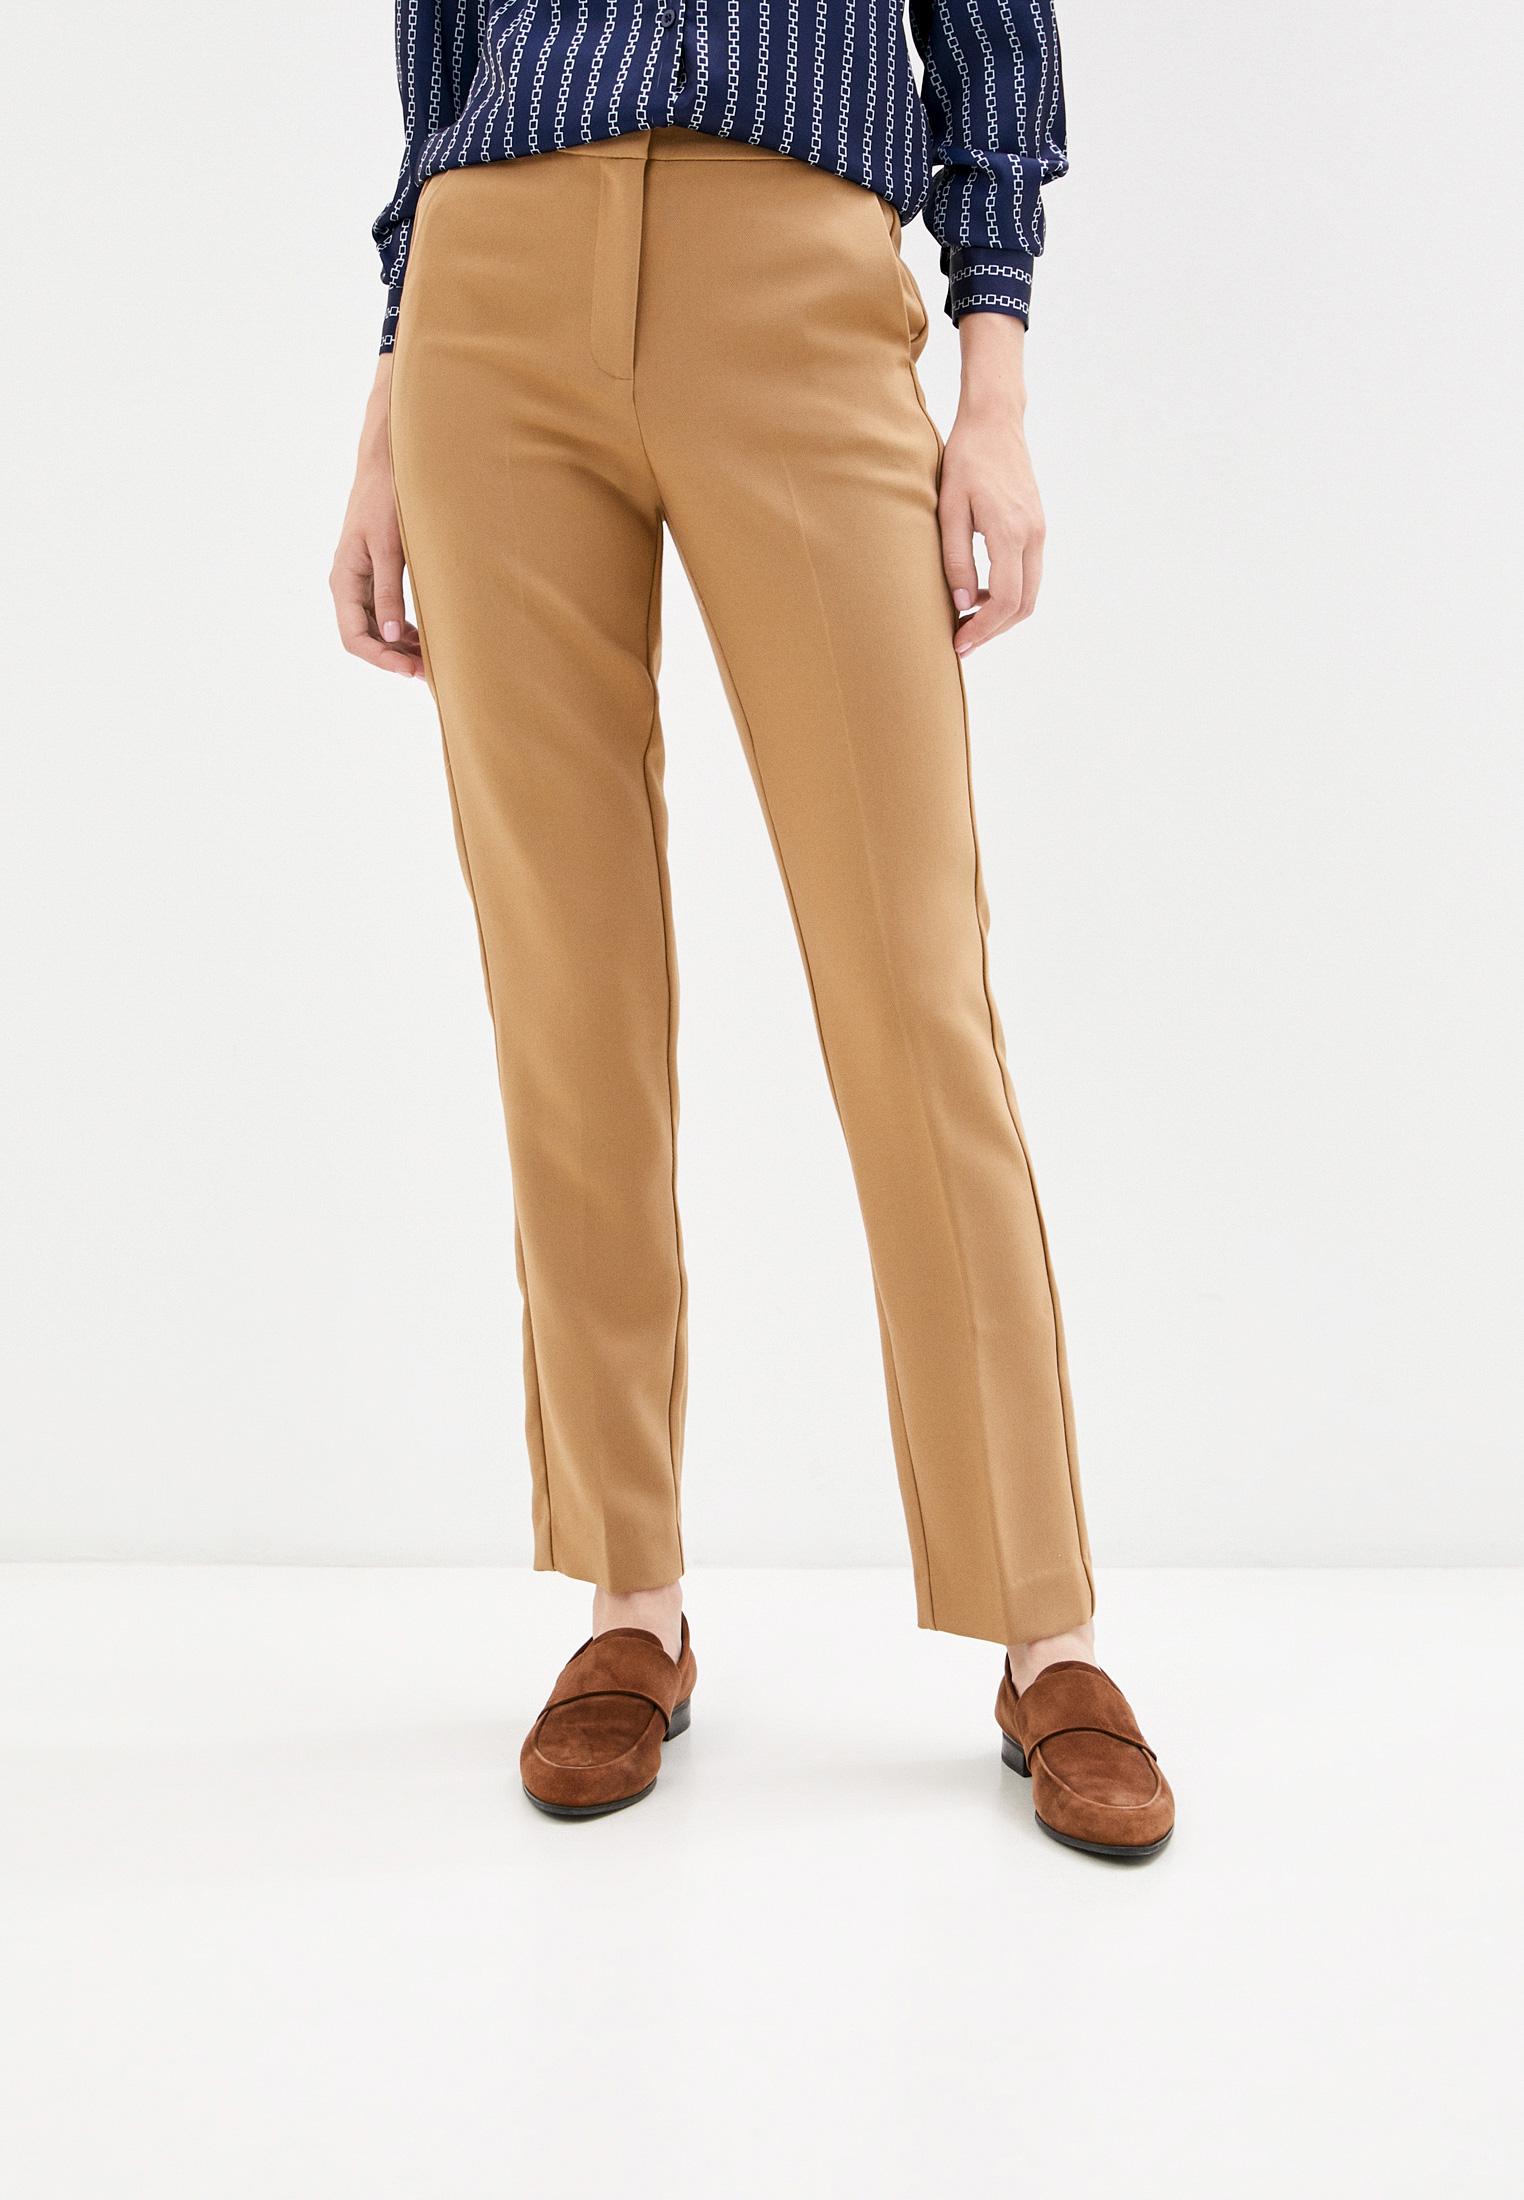 Женские классические брюки Tommy Hilfiger (Томми Хилфигер) Брюки Tommy Hilfiger